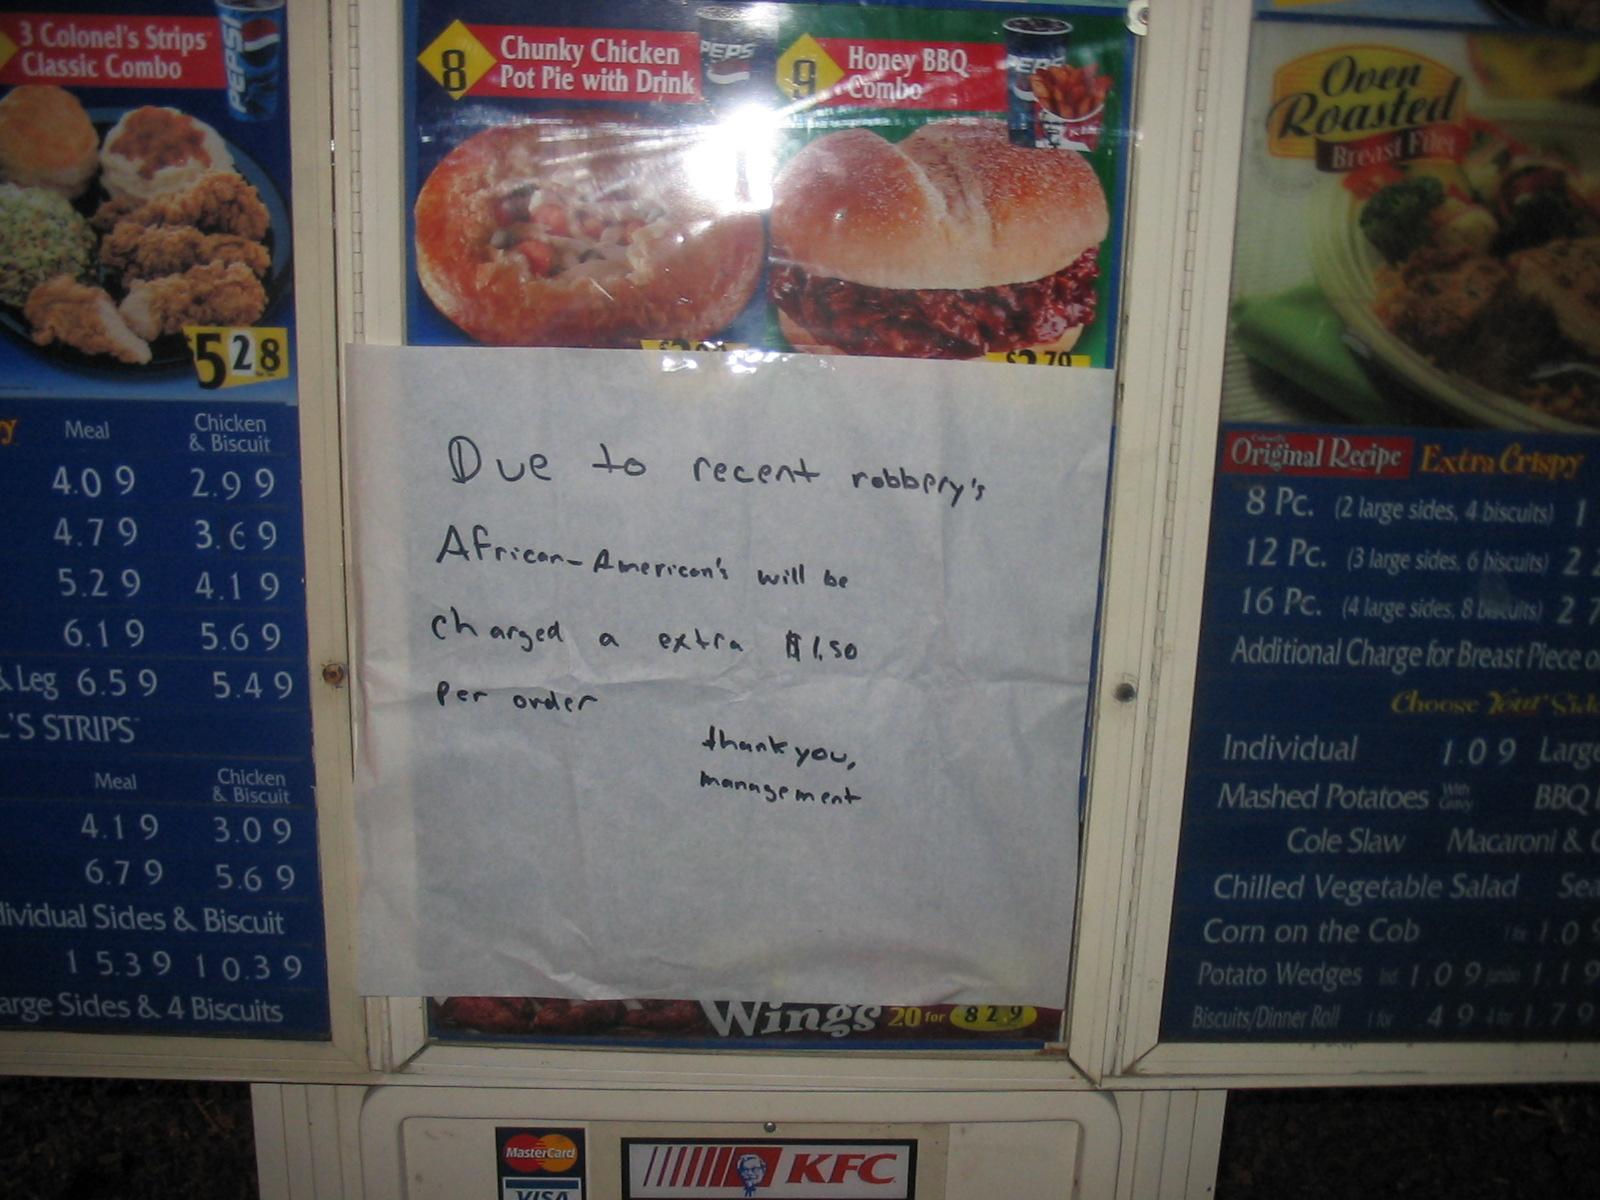 recent-robberies.jpg